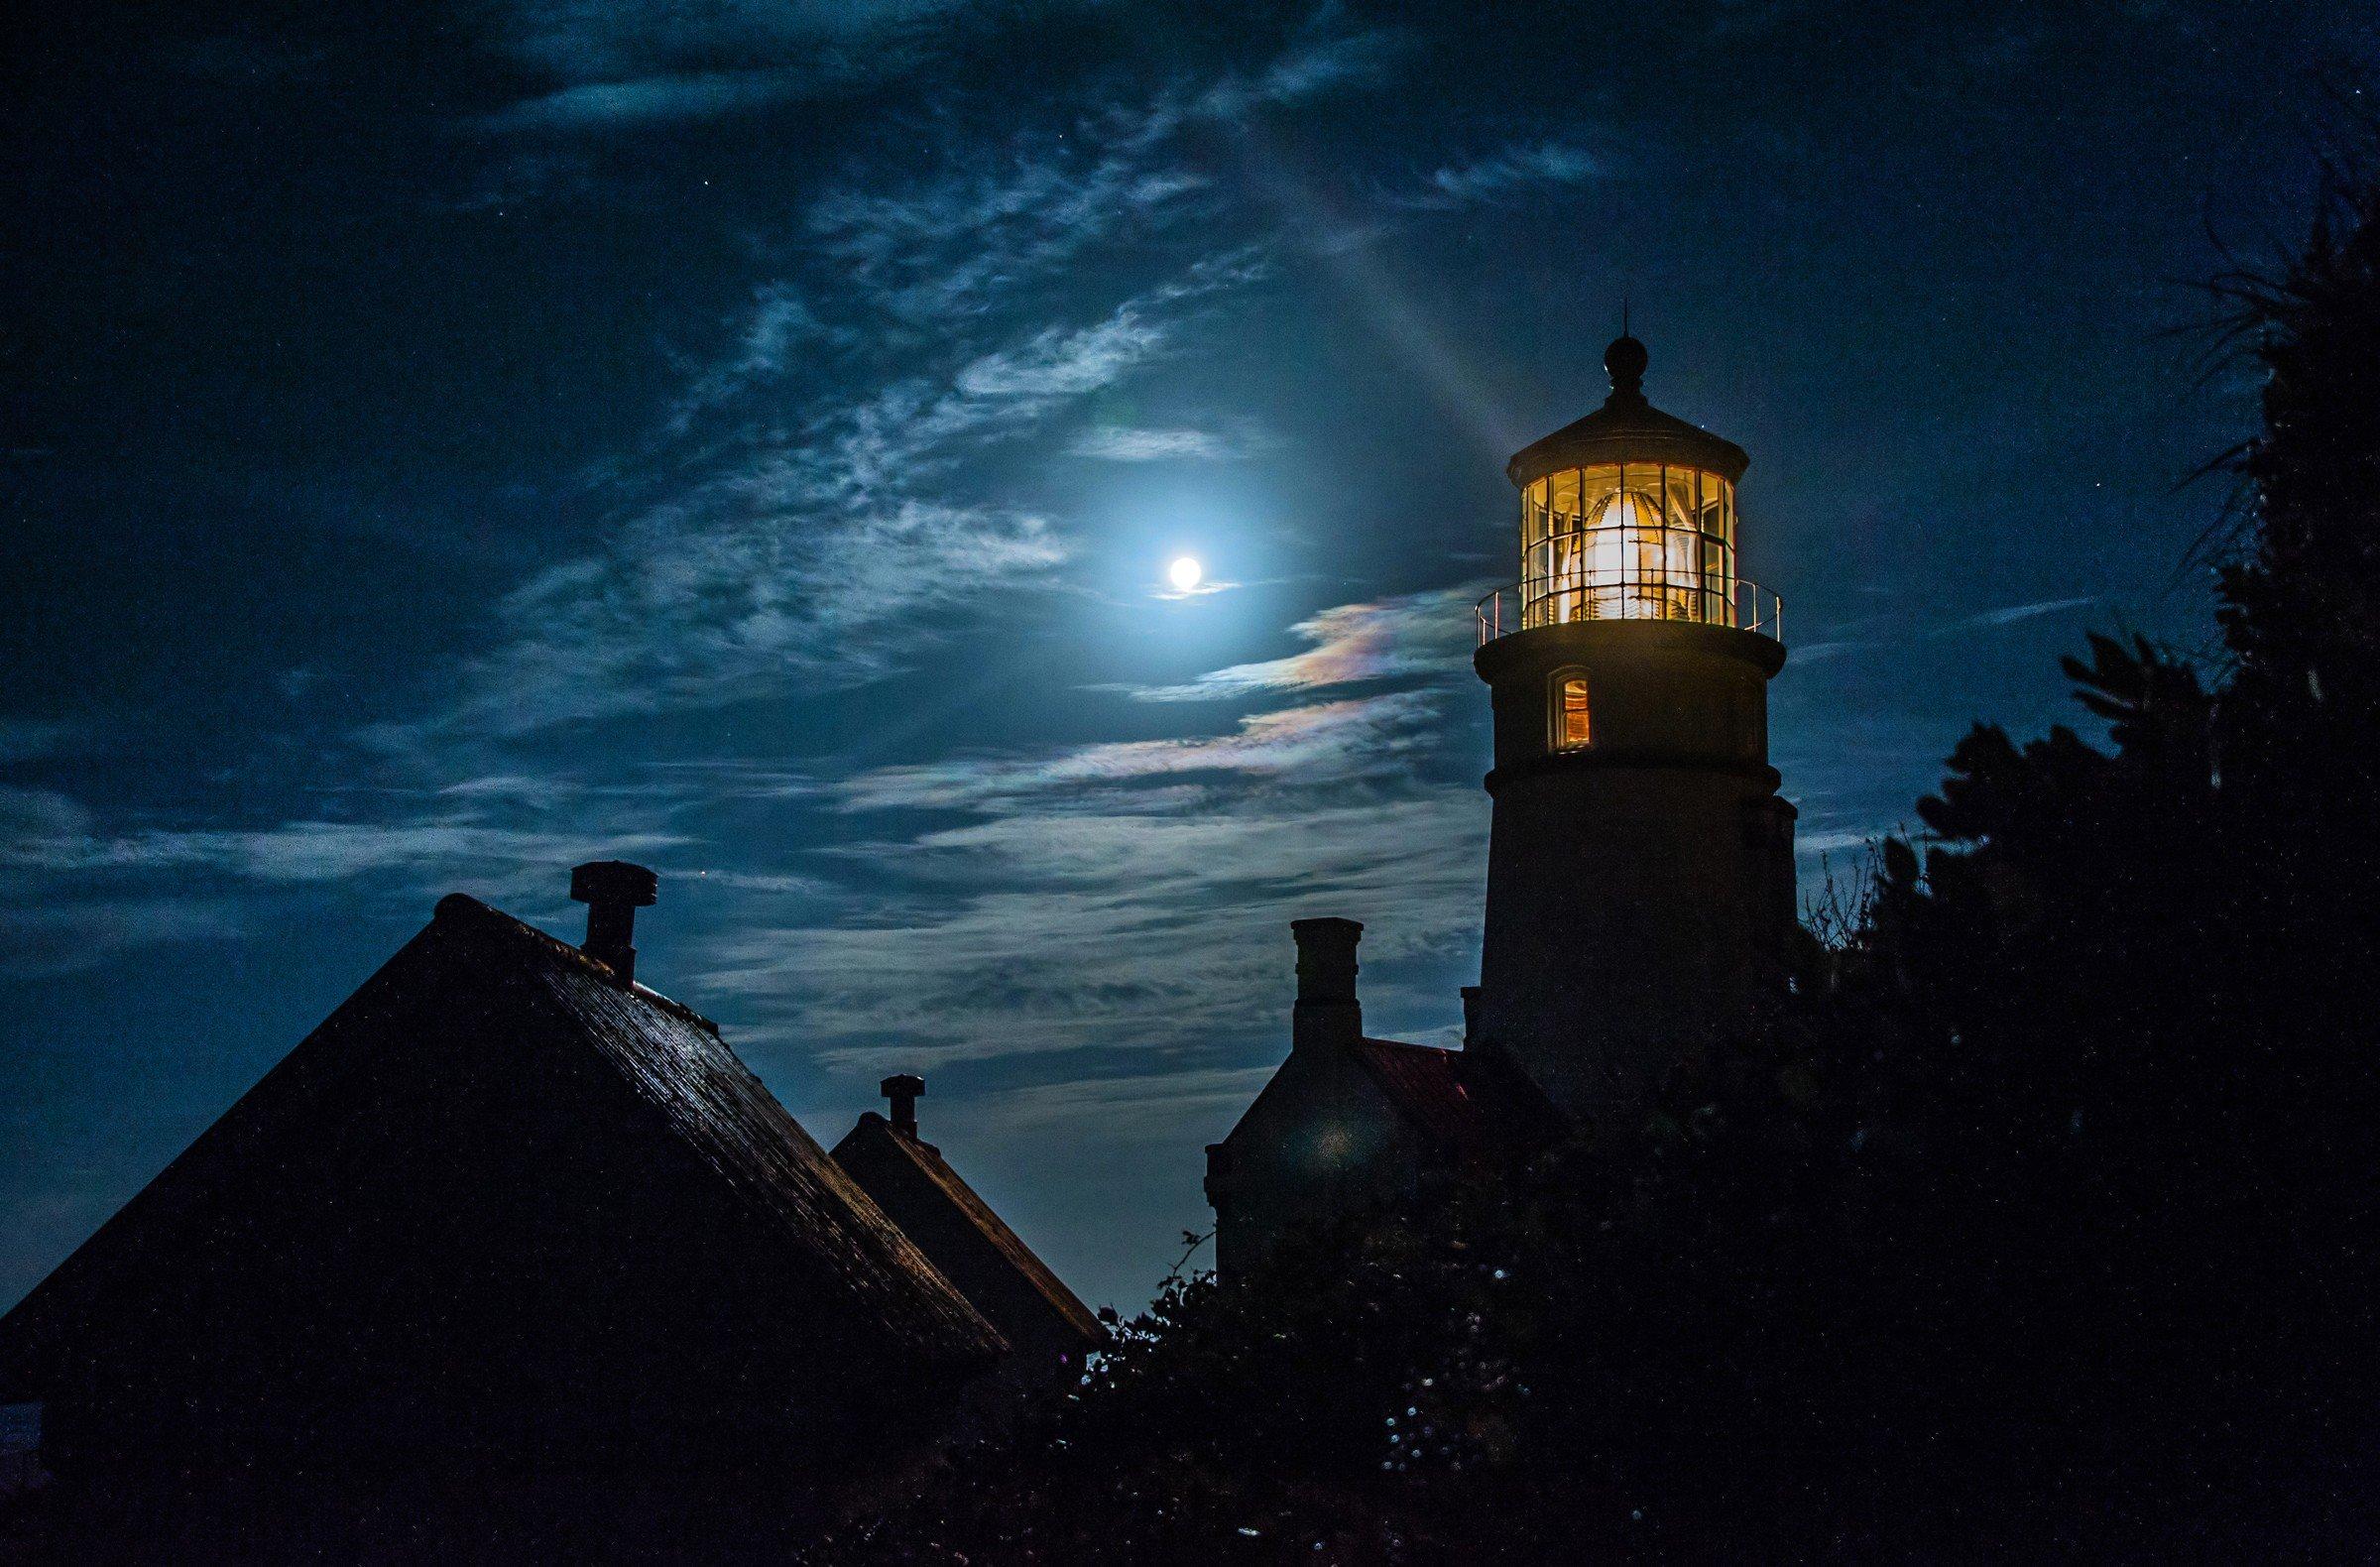 lighthouse at night - HD2400×1580